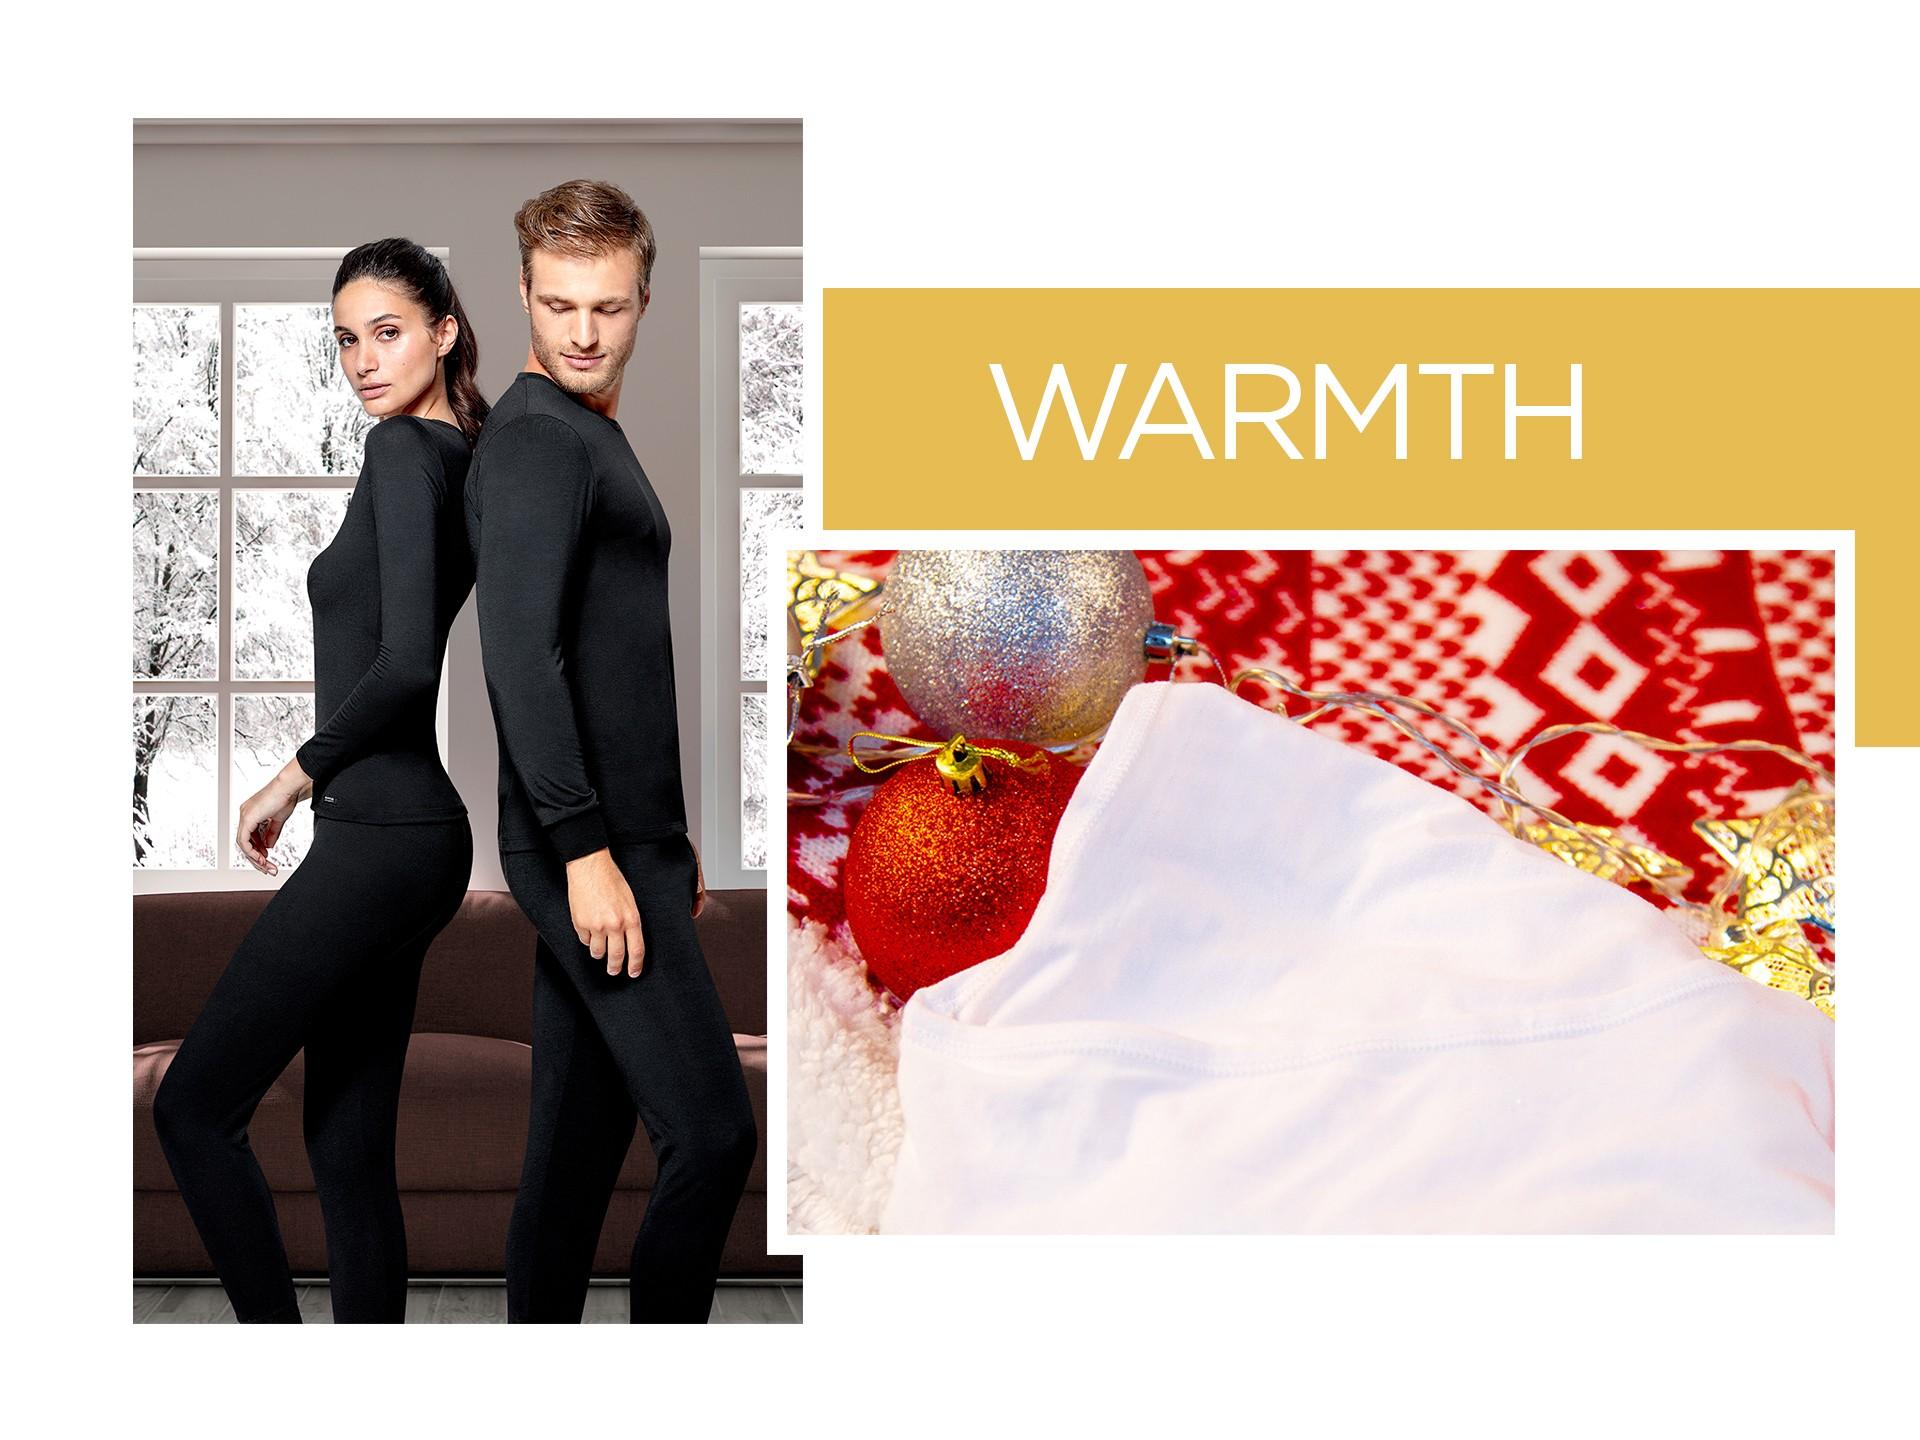 Thermal underwear for men, women and children | Underwear for Christmas | Impetus